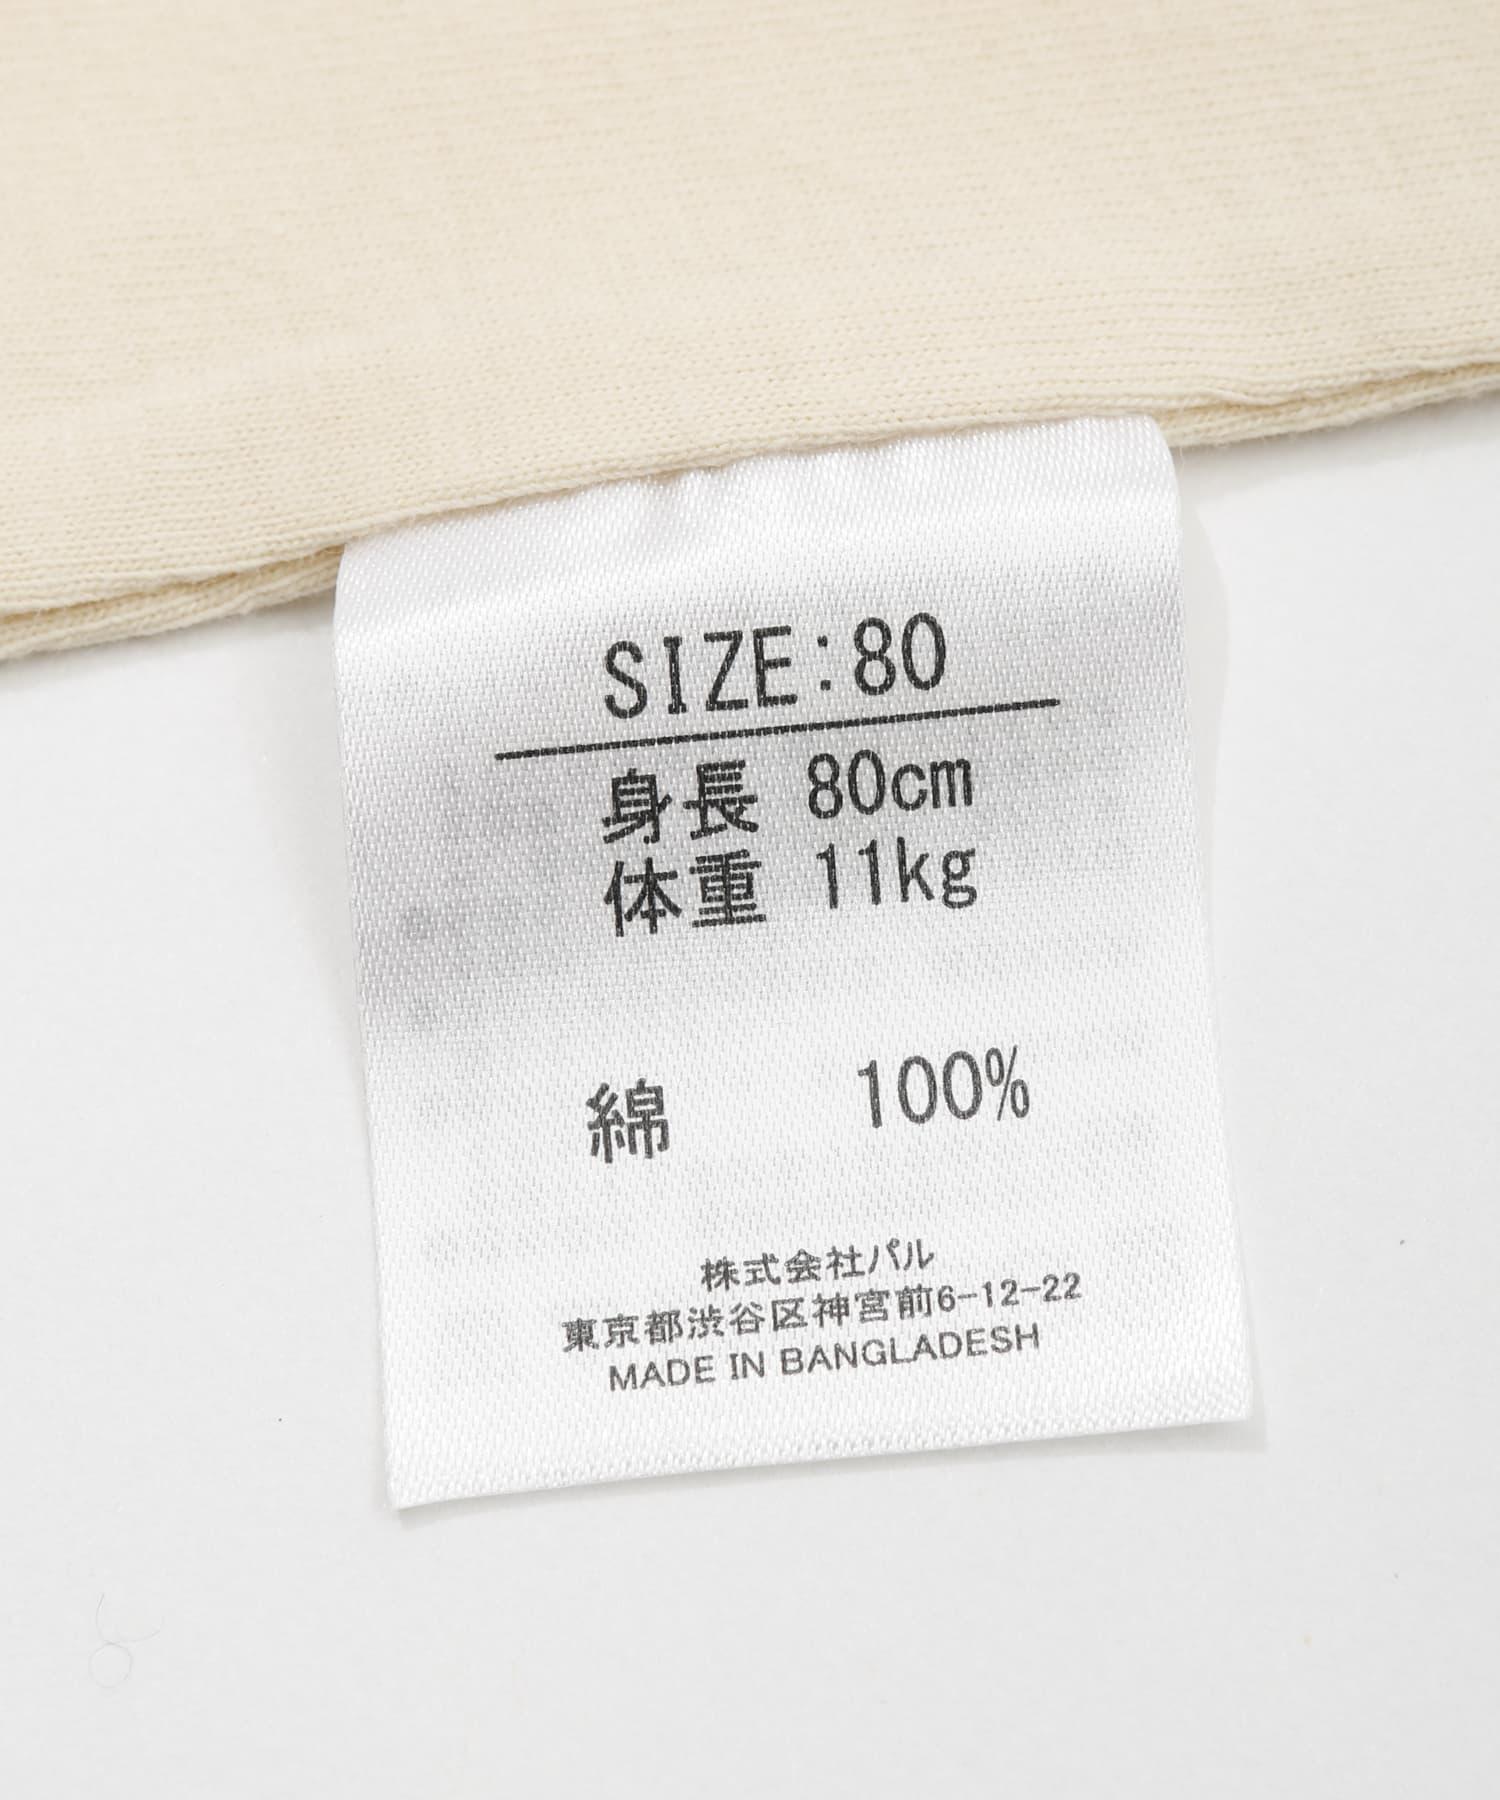 3COINS(スリーコインズ) 【おめかし・一部店舗限定】ロンパース 80cm